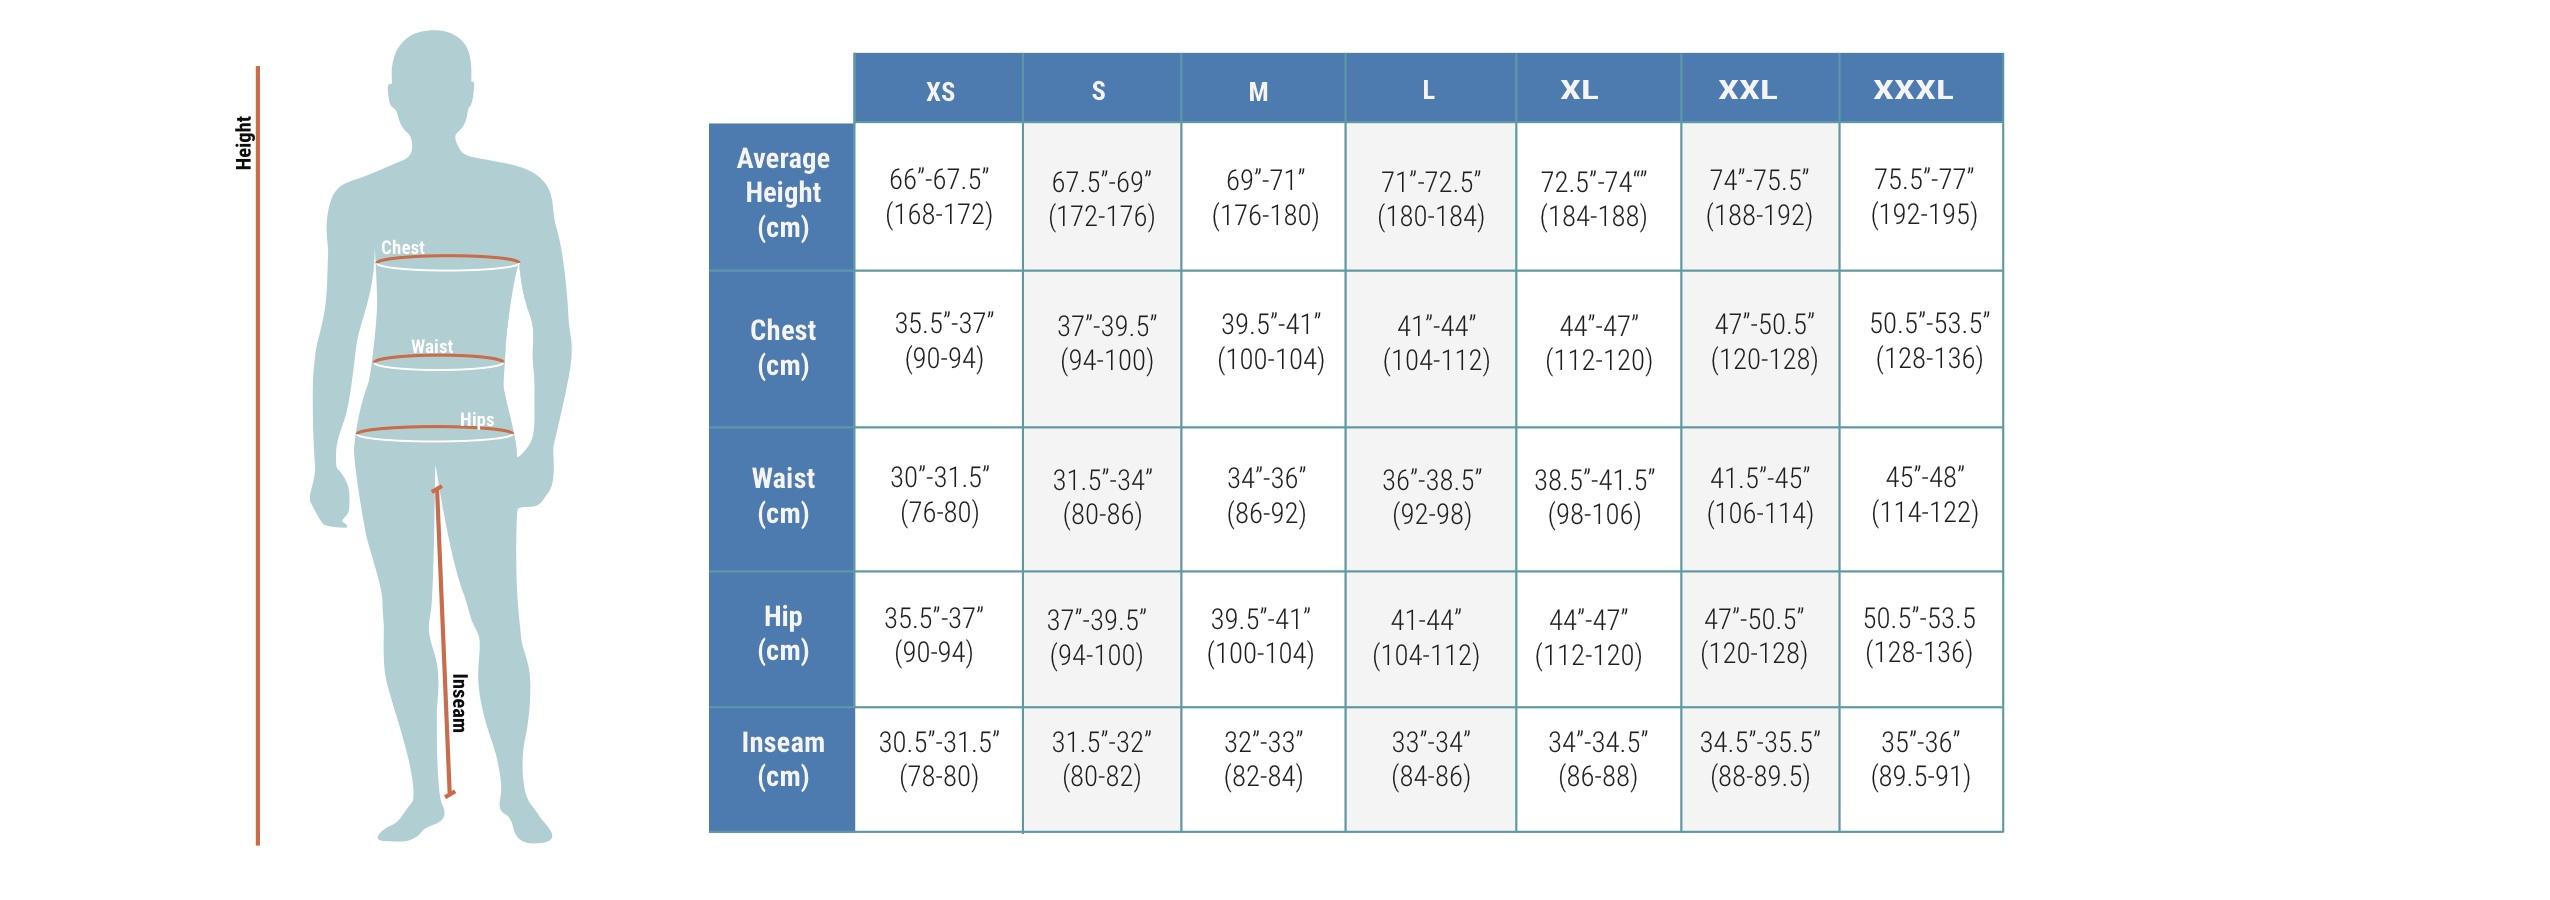 fwg-hh-mens-sizing-chart.jpg